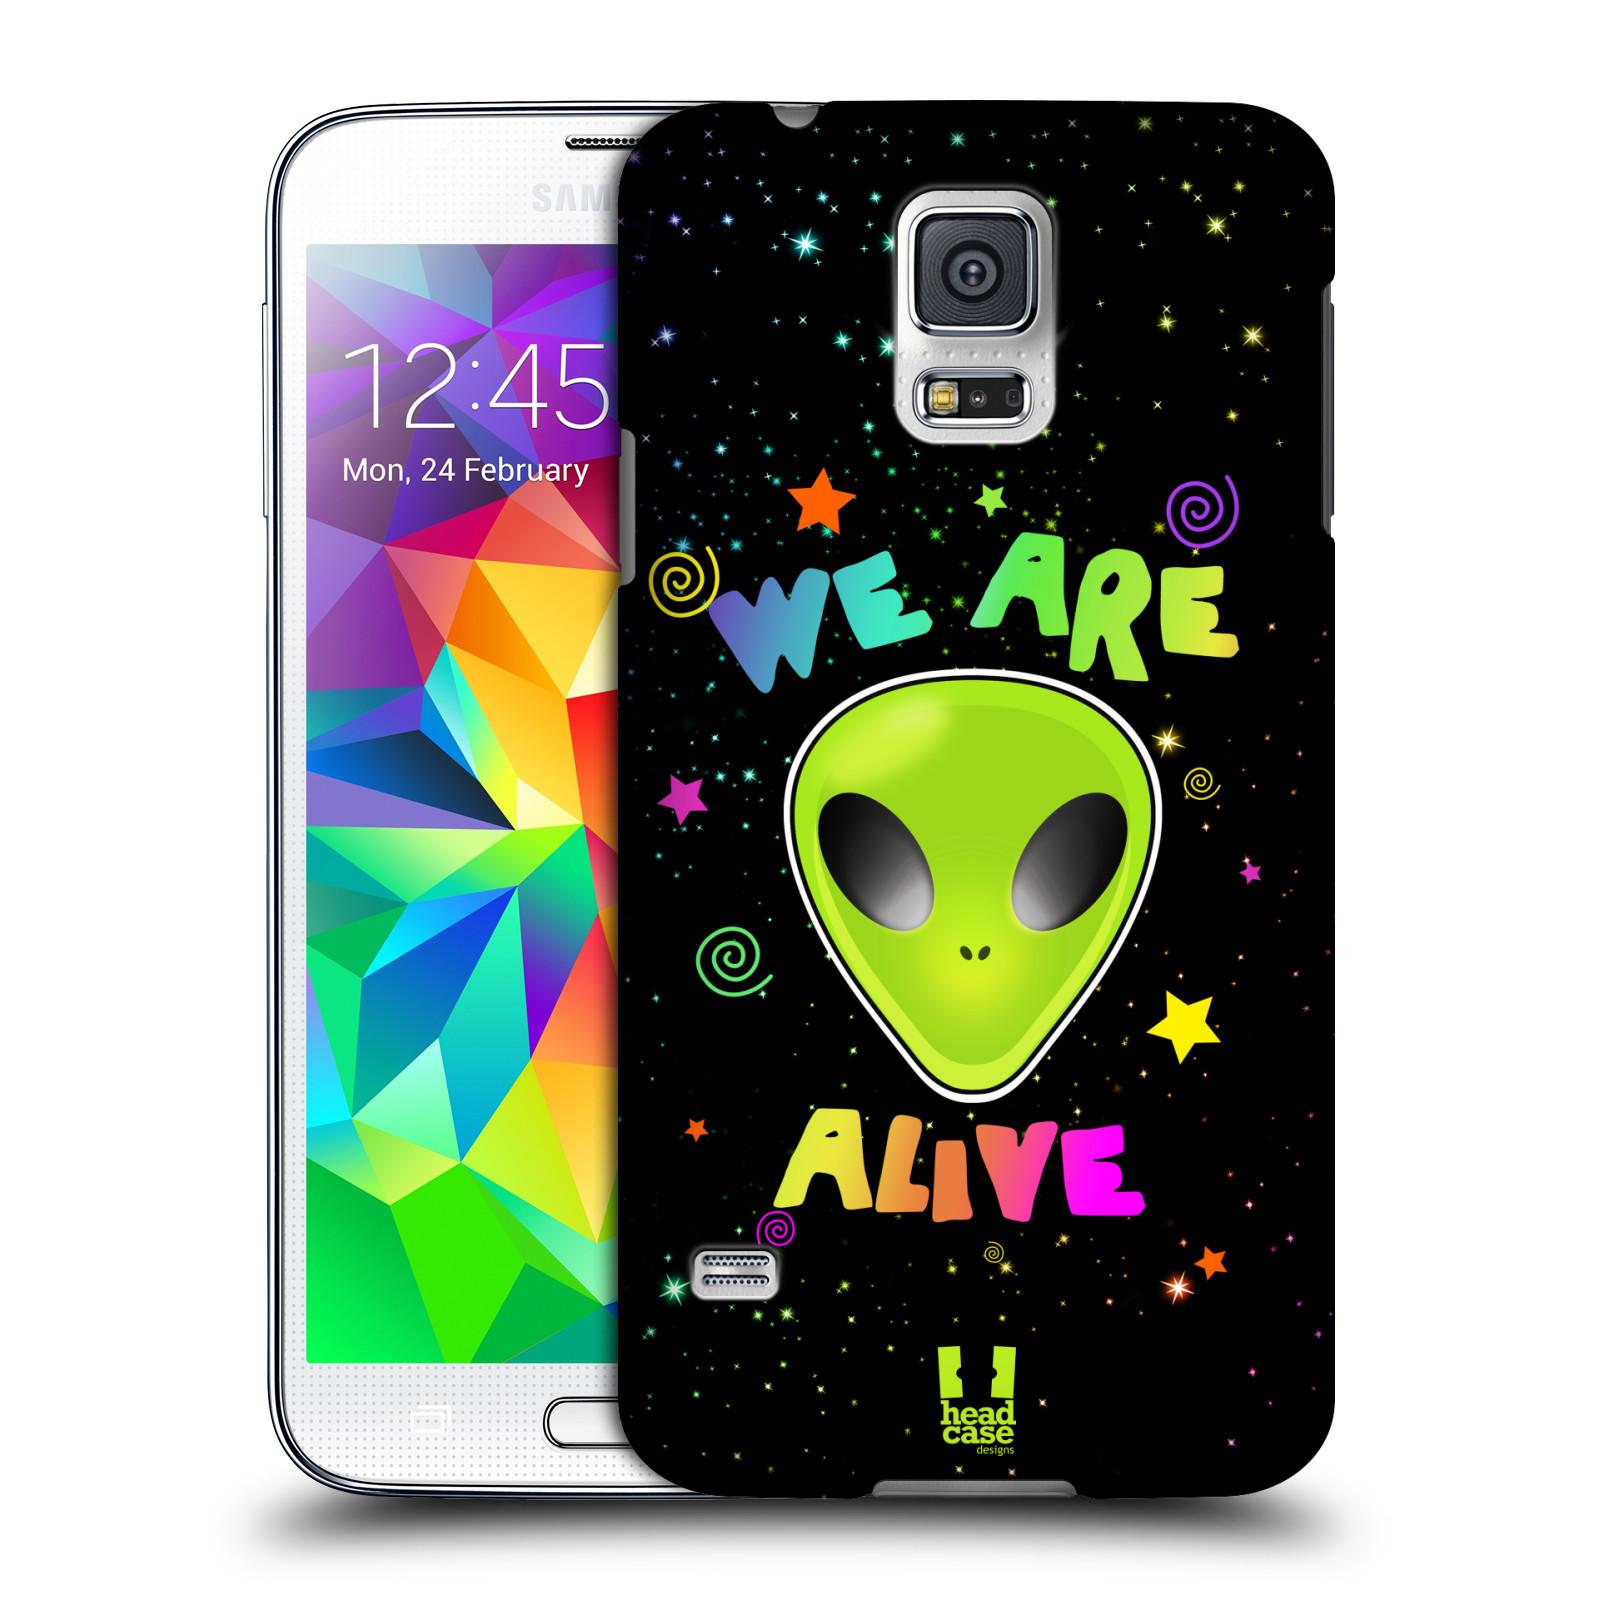 Plastové pouzdro na mobil Samsung Galaxy S5 HEAD CASE ALIENS ALIVE